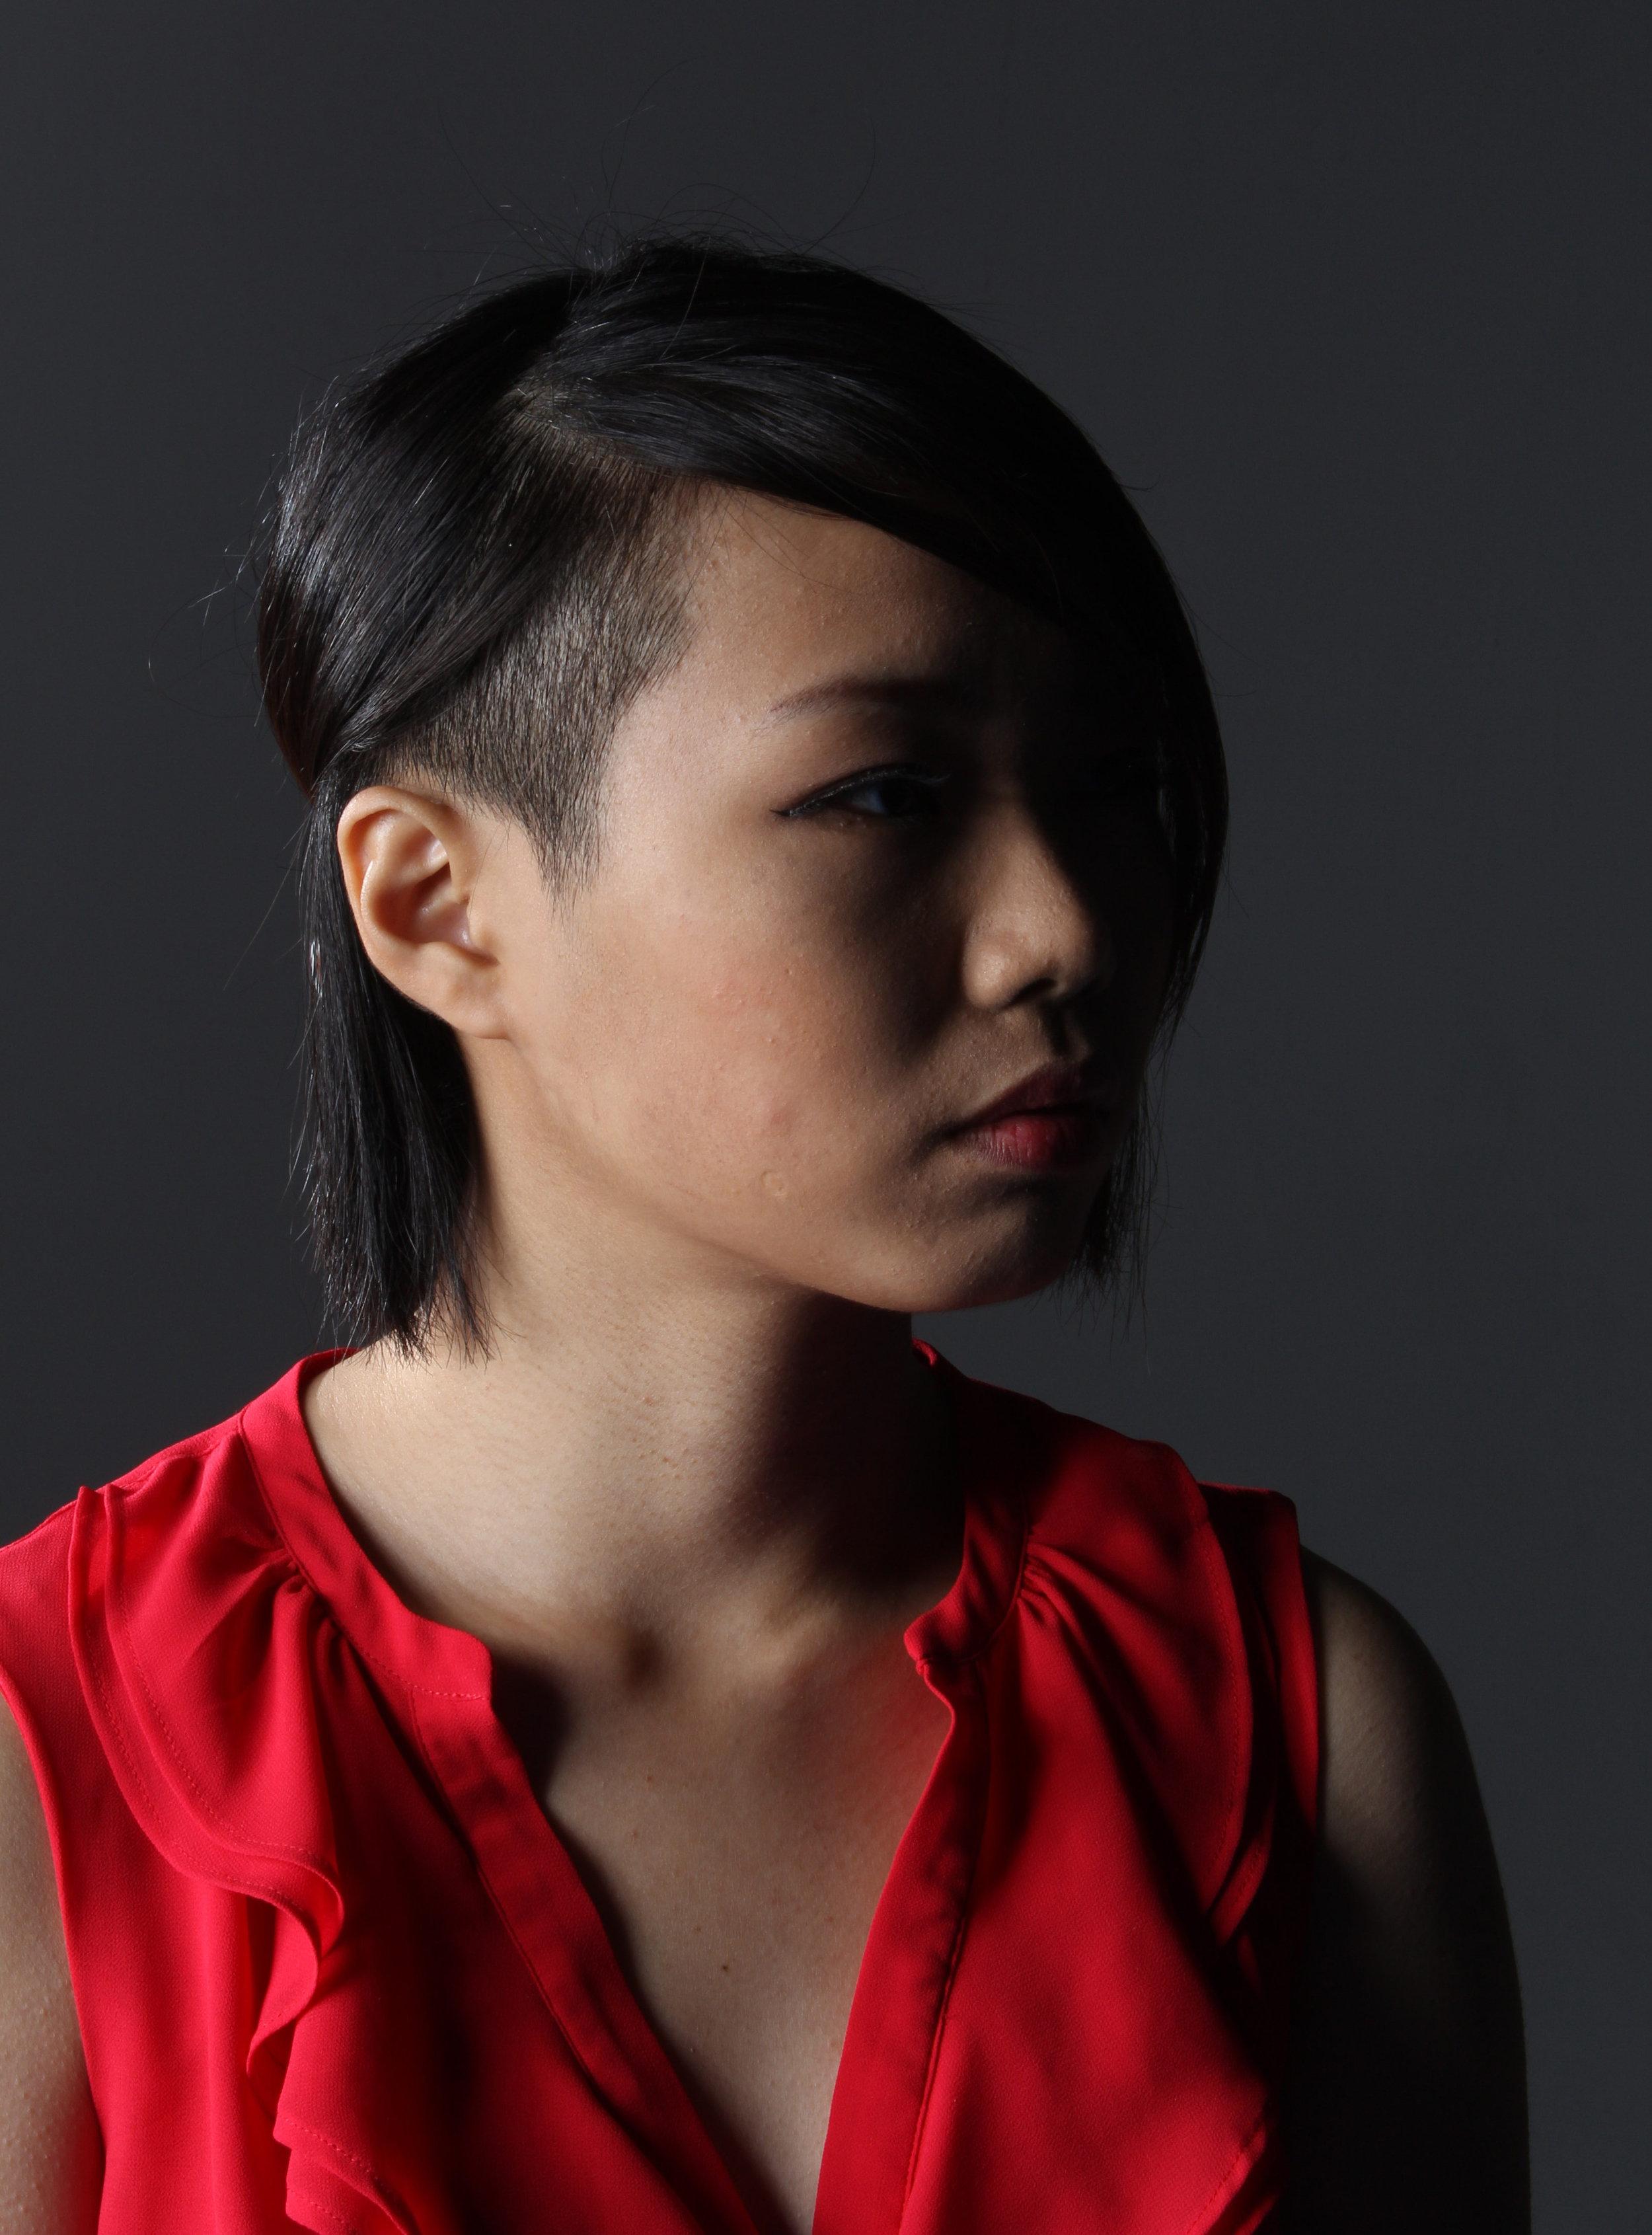 Ariel Huang